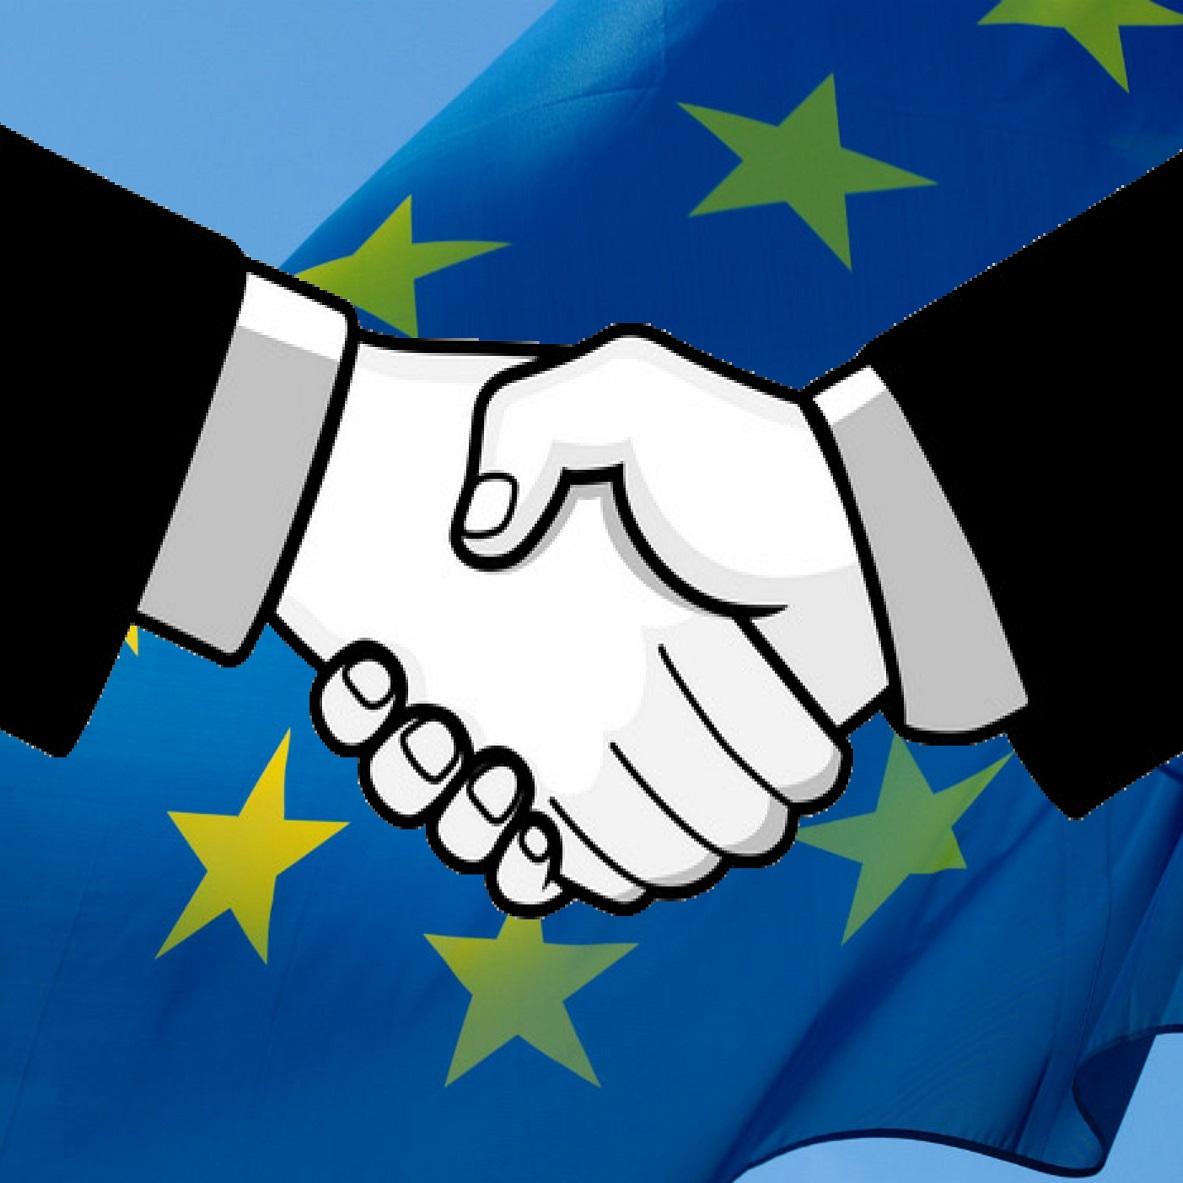 Cross-border cooperation Image